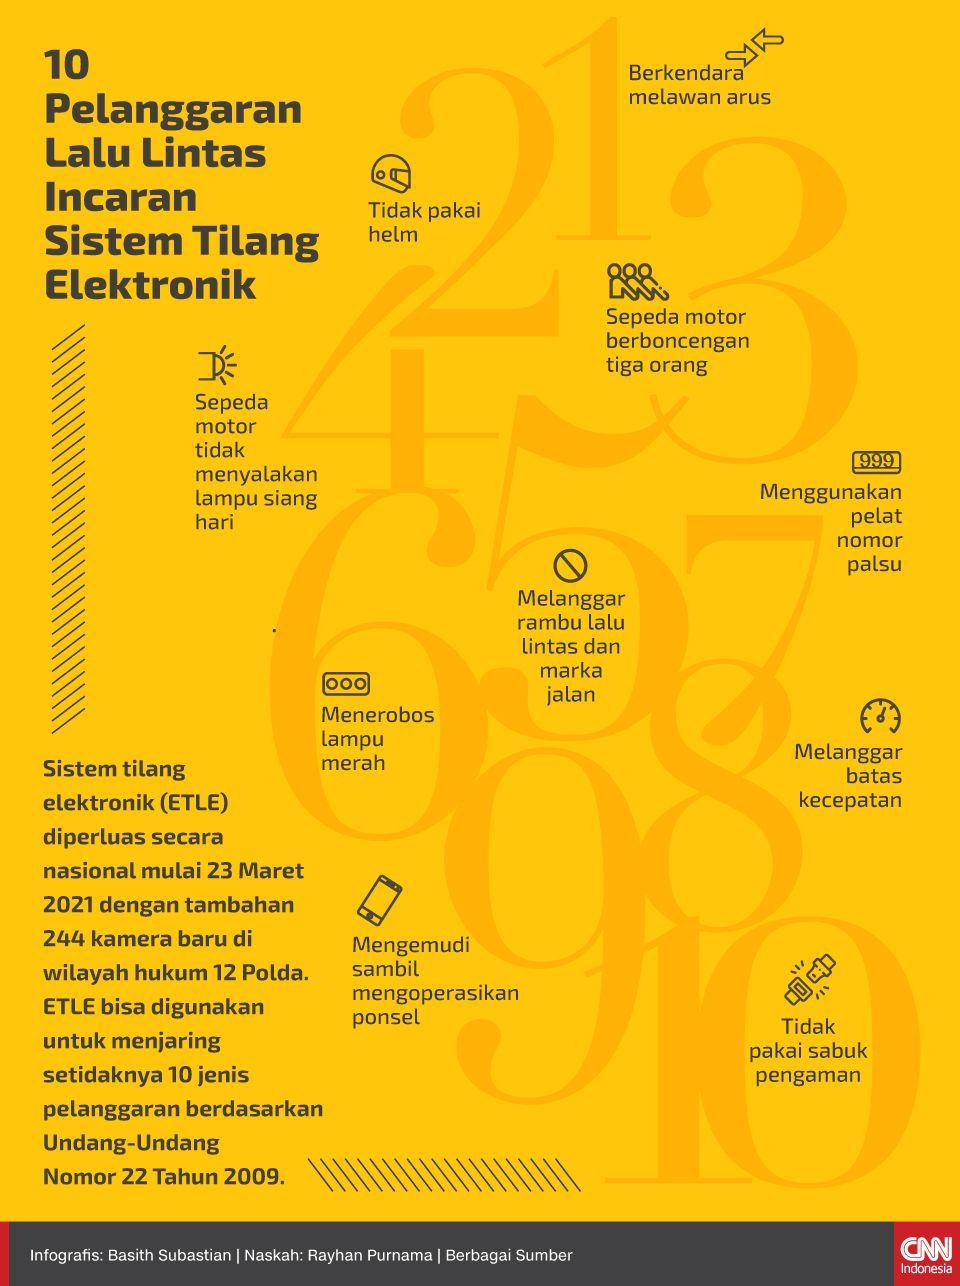 Infografis - 10 Pelanggaran Lalu Lintas Incaran Sistem Tilang Elektronik